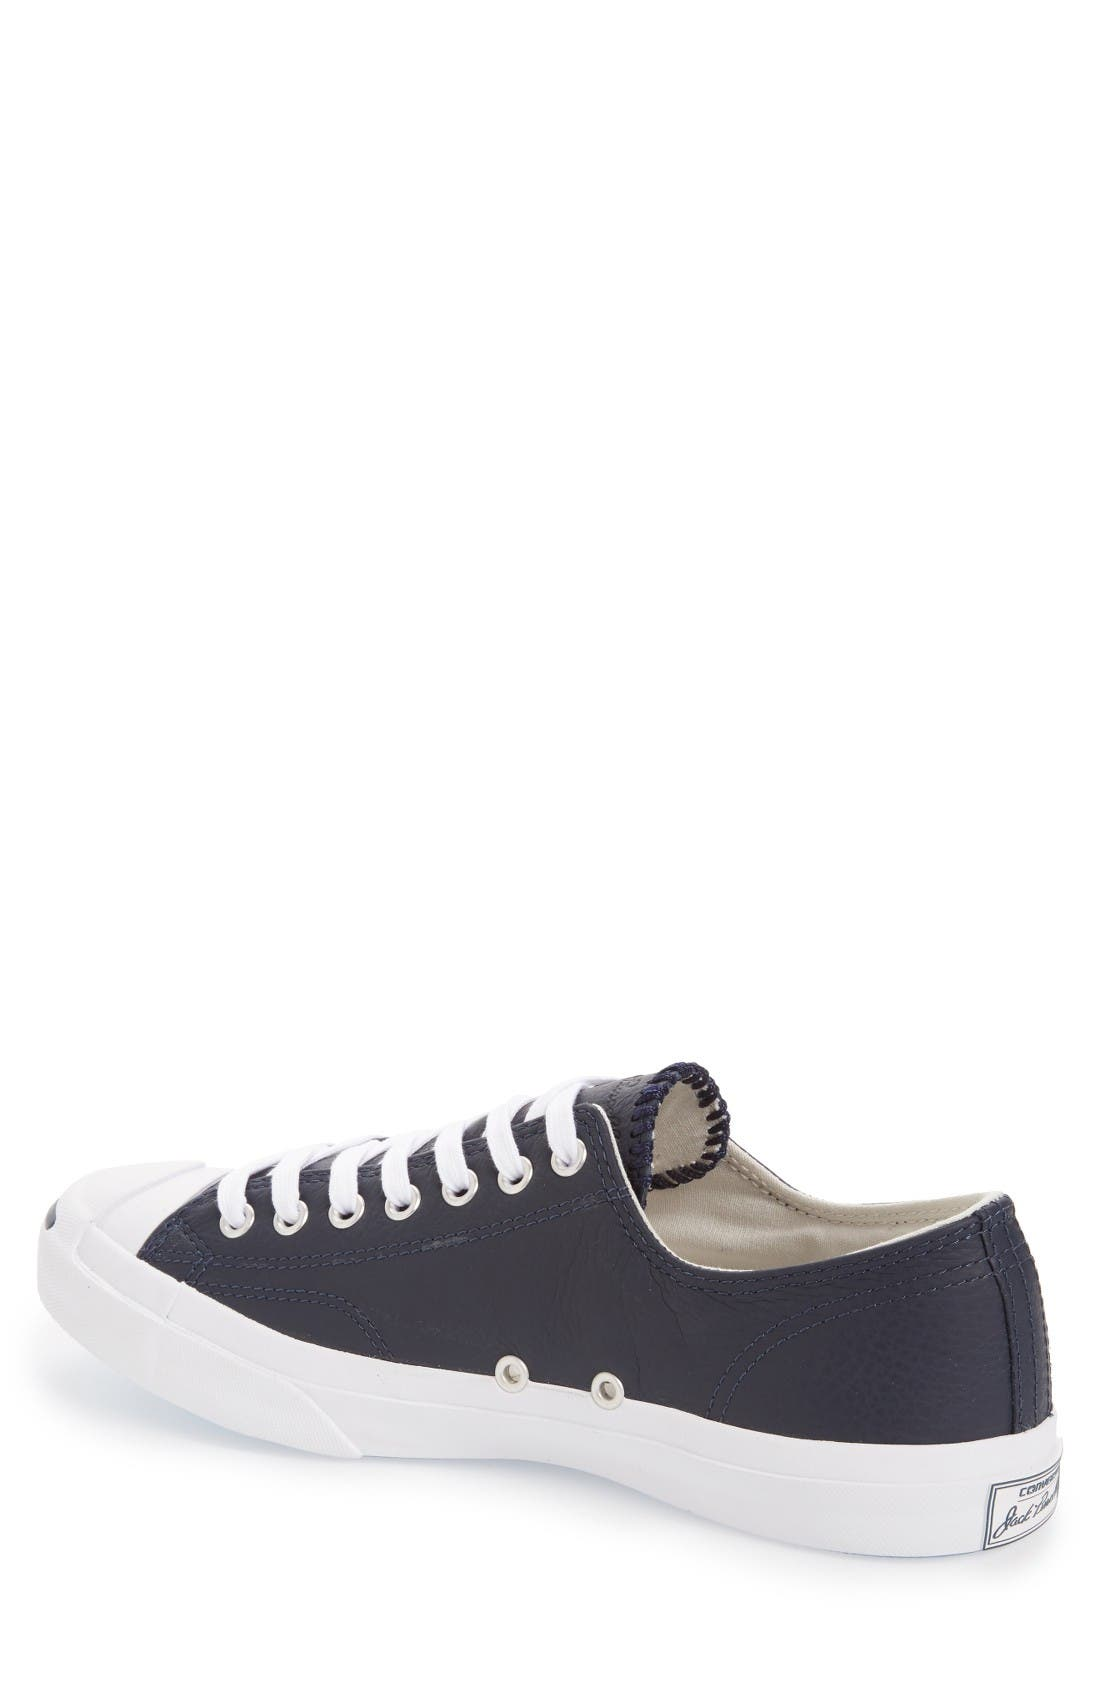 Alternate Image 2  - Converse 'JP Jack' Sneaker (Men)